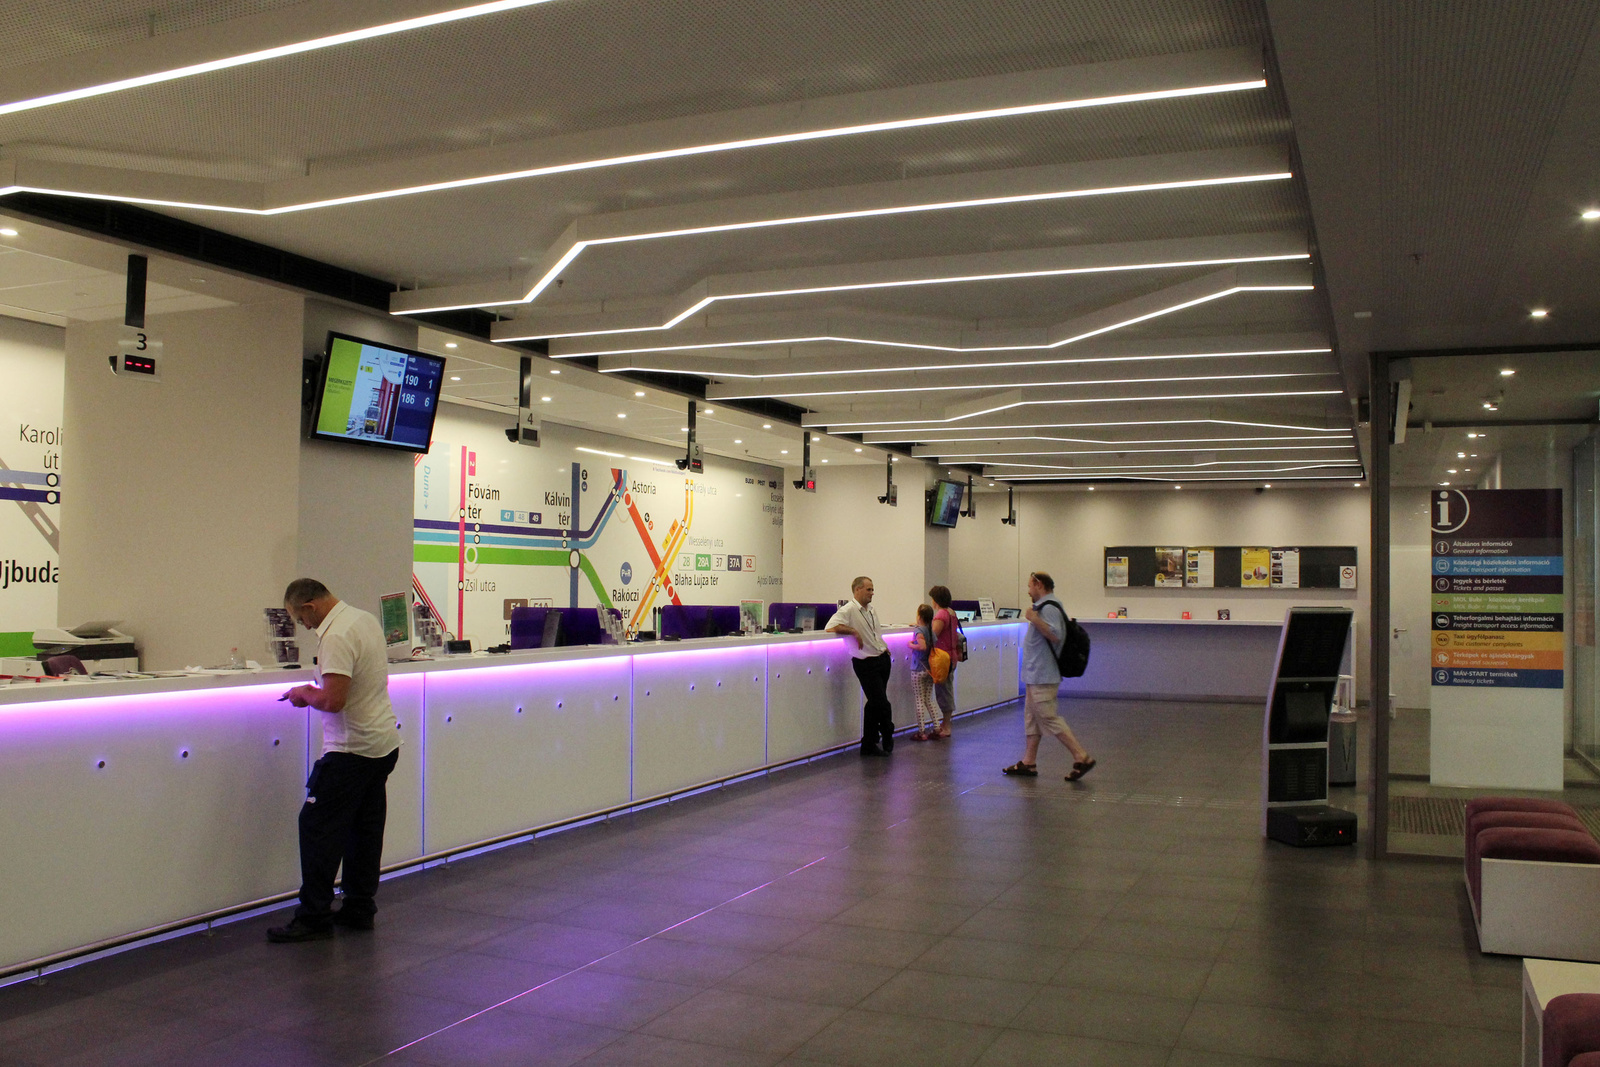 Metro4-KelenfoldVasutallomas-20150817-26